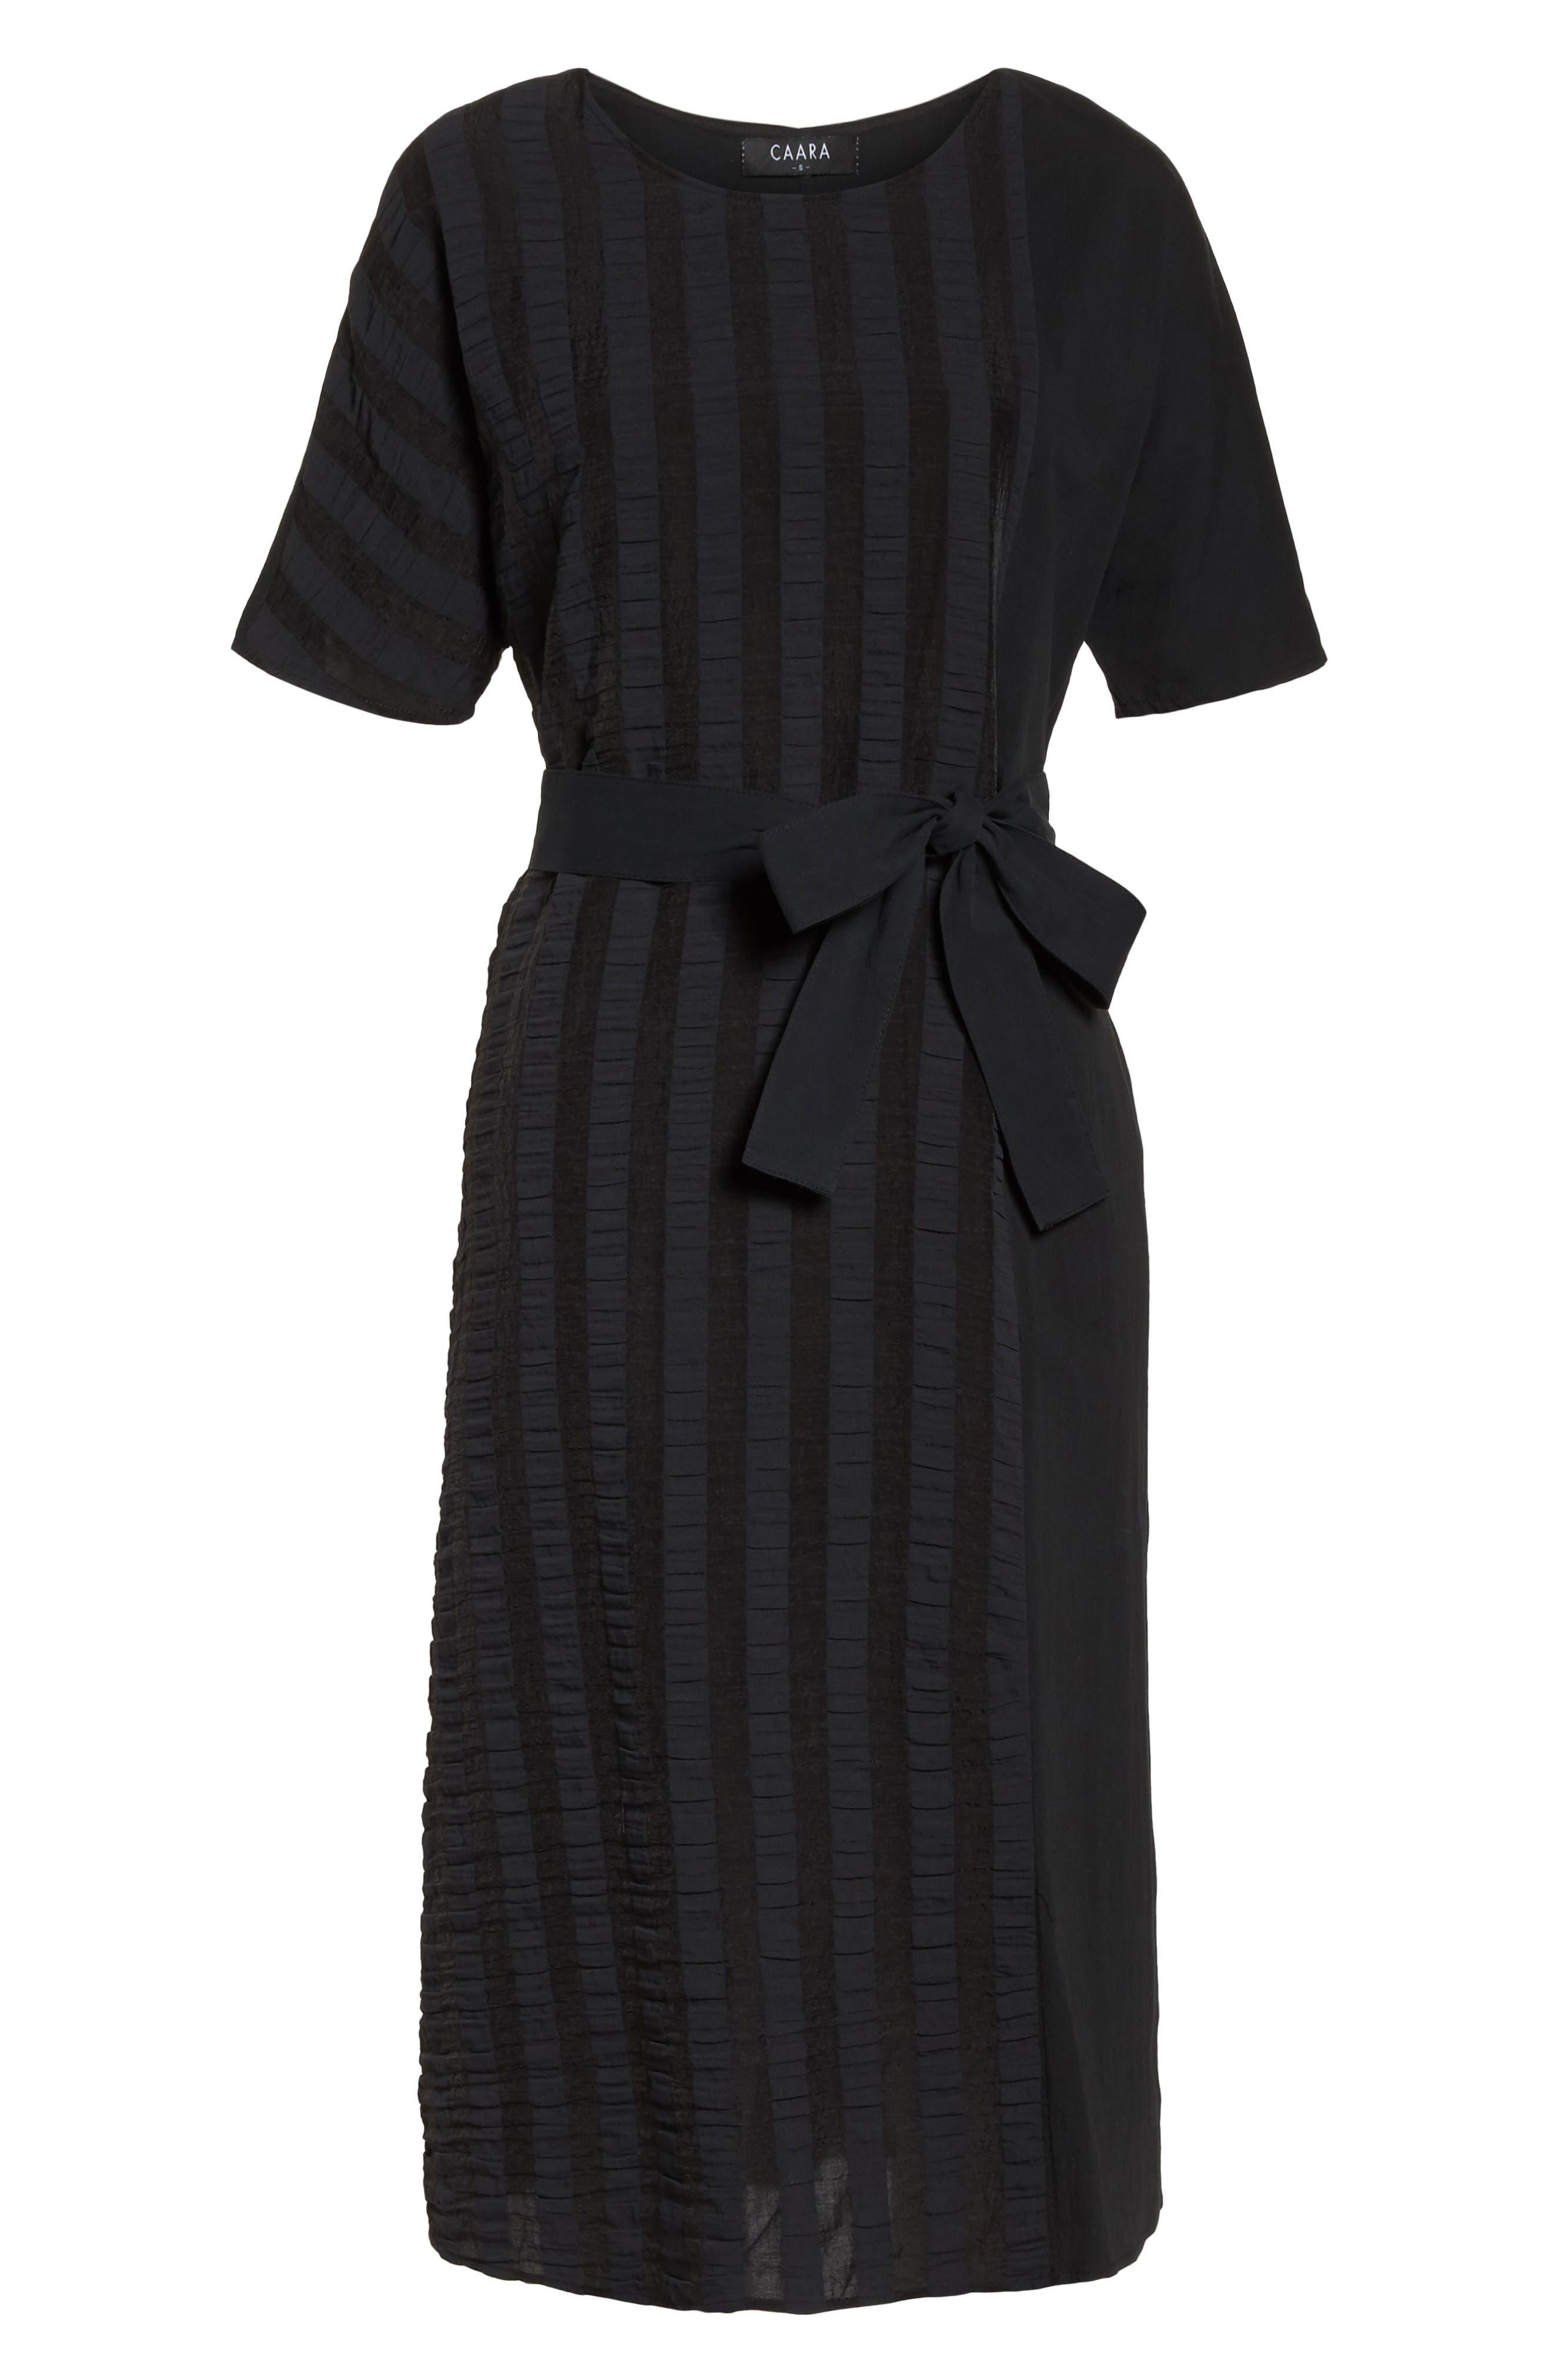 Throwing Shade Midi Dress,                             Alternate thumbnail 7, color,                             001